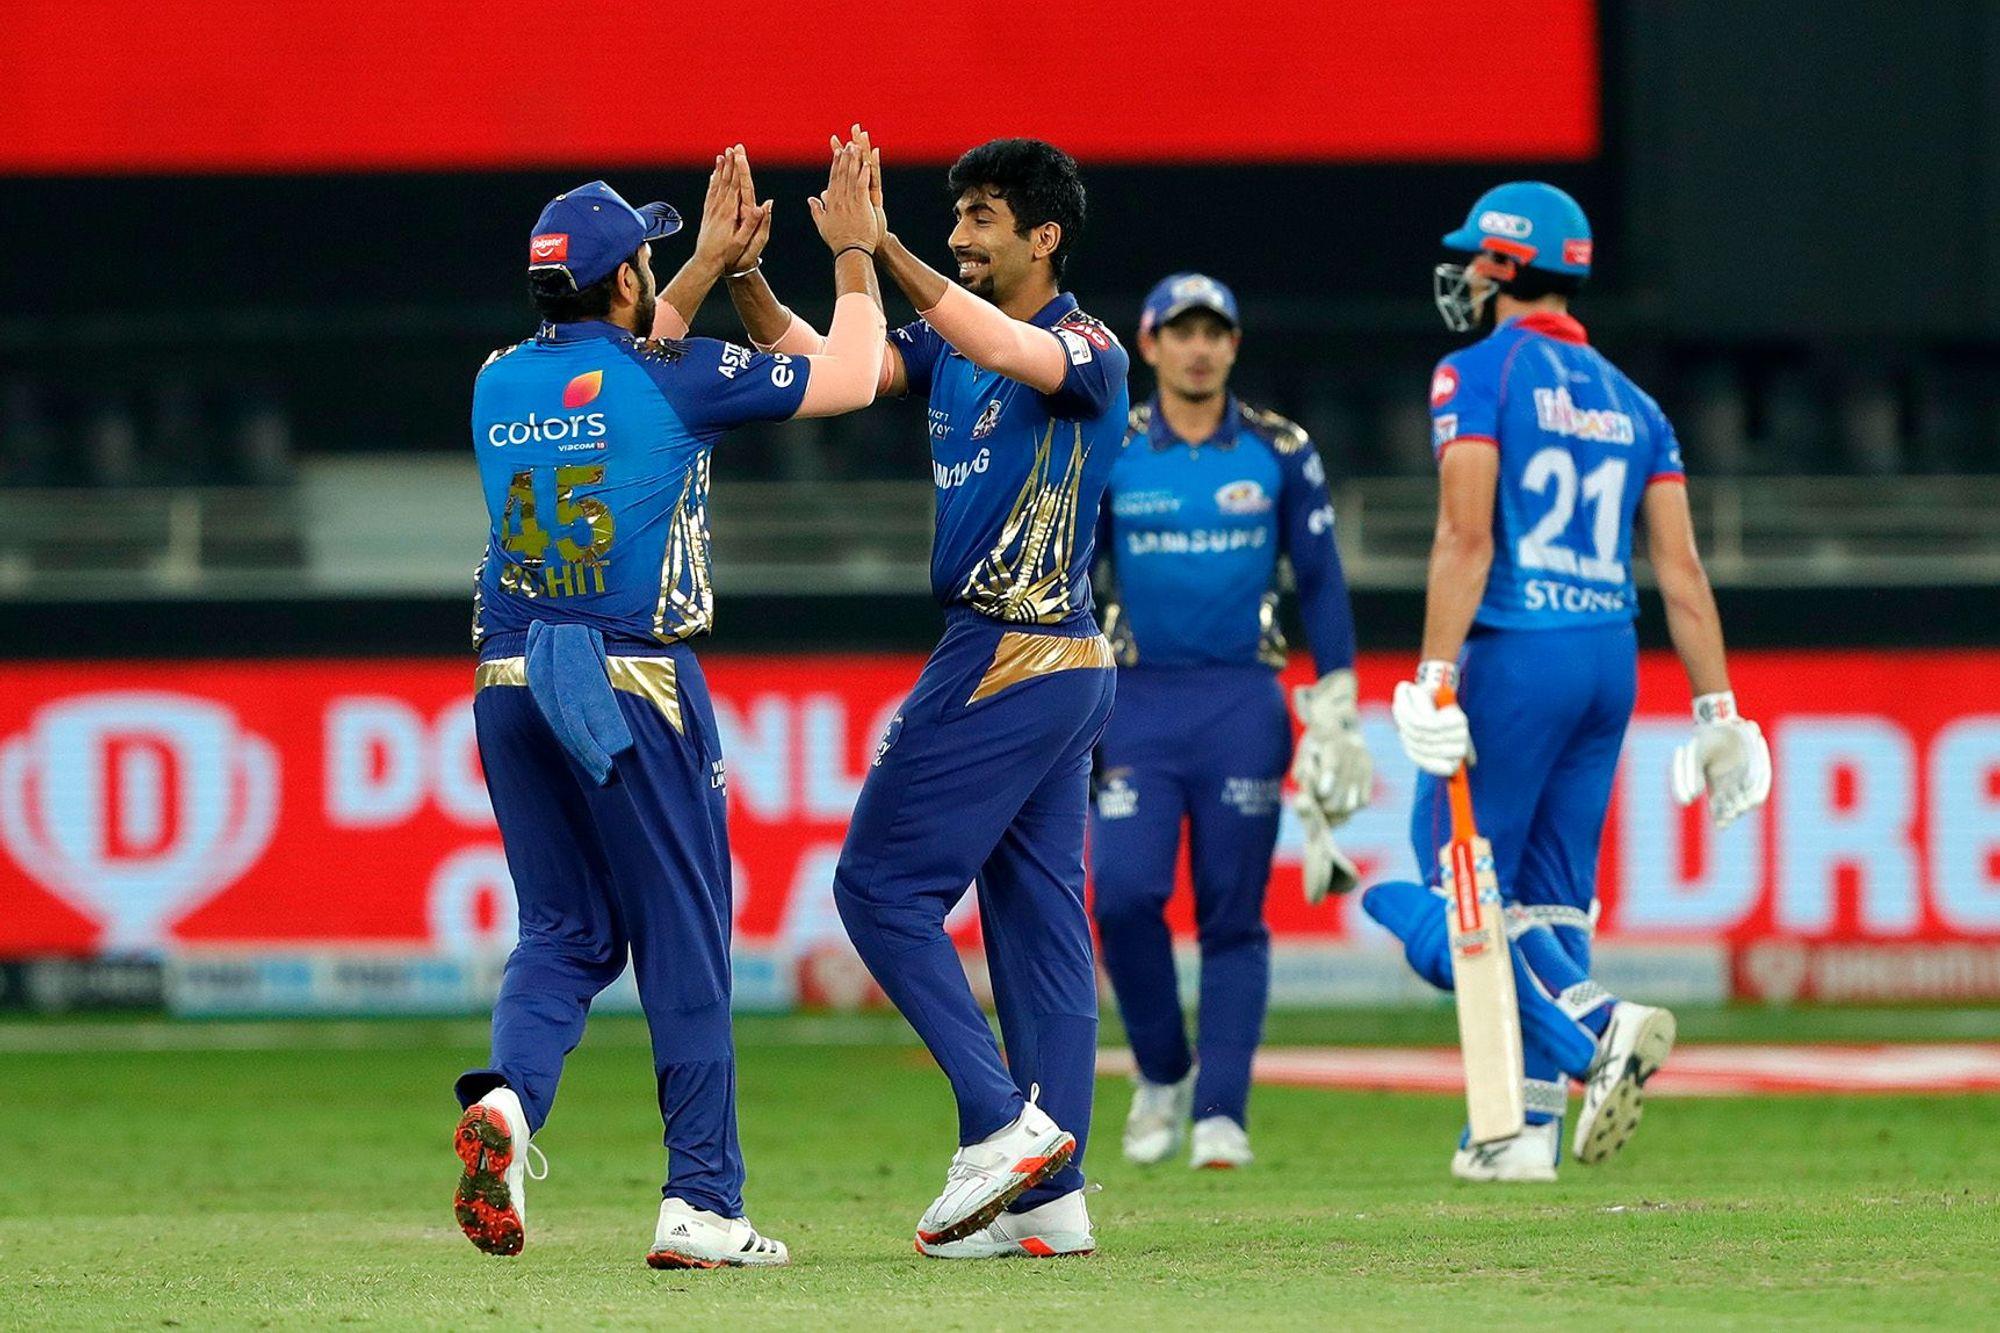 Jasprit Bumrah took 27 wickets in IPL 2020. (Photo - BCCI / IPL)